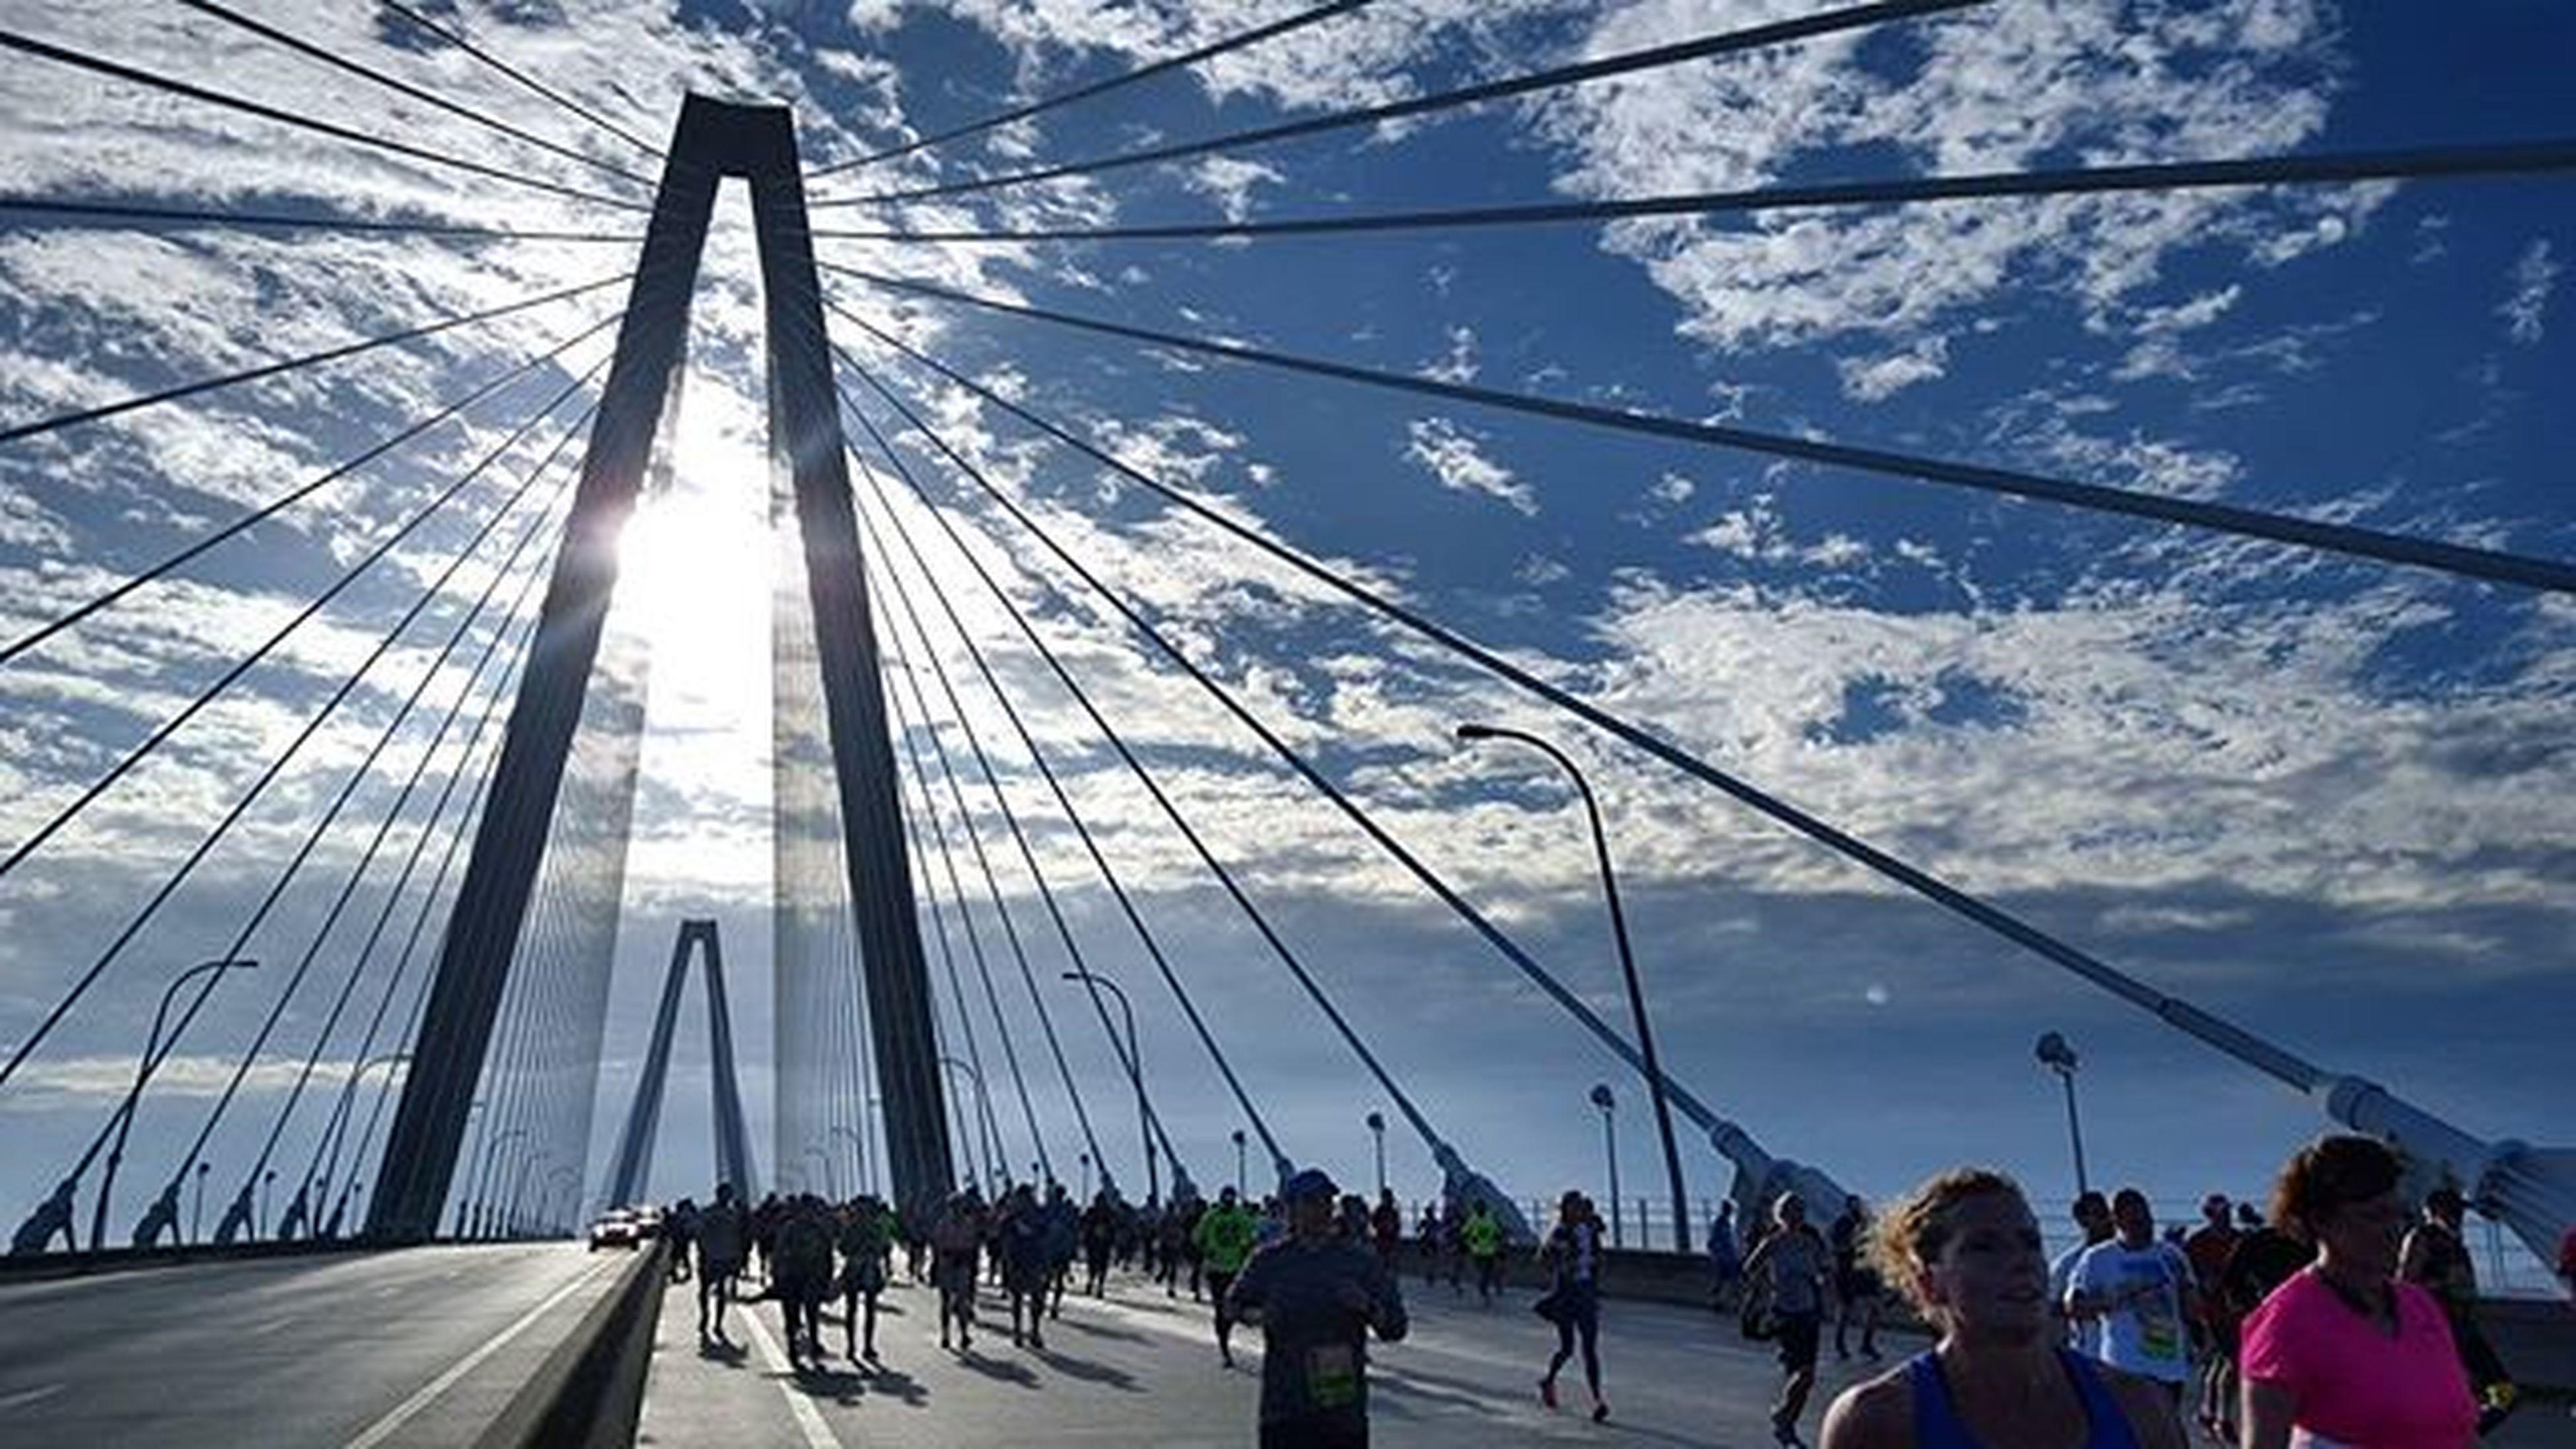 Beatiful day on the Bridge @cooperriverbridgerun Socharleston Charleston CRBR 10k Running Ihaterunning Photojournalism Gettyreportage Sunny Found On The Roll